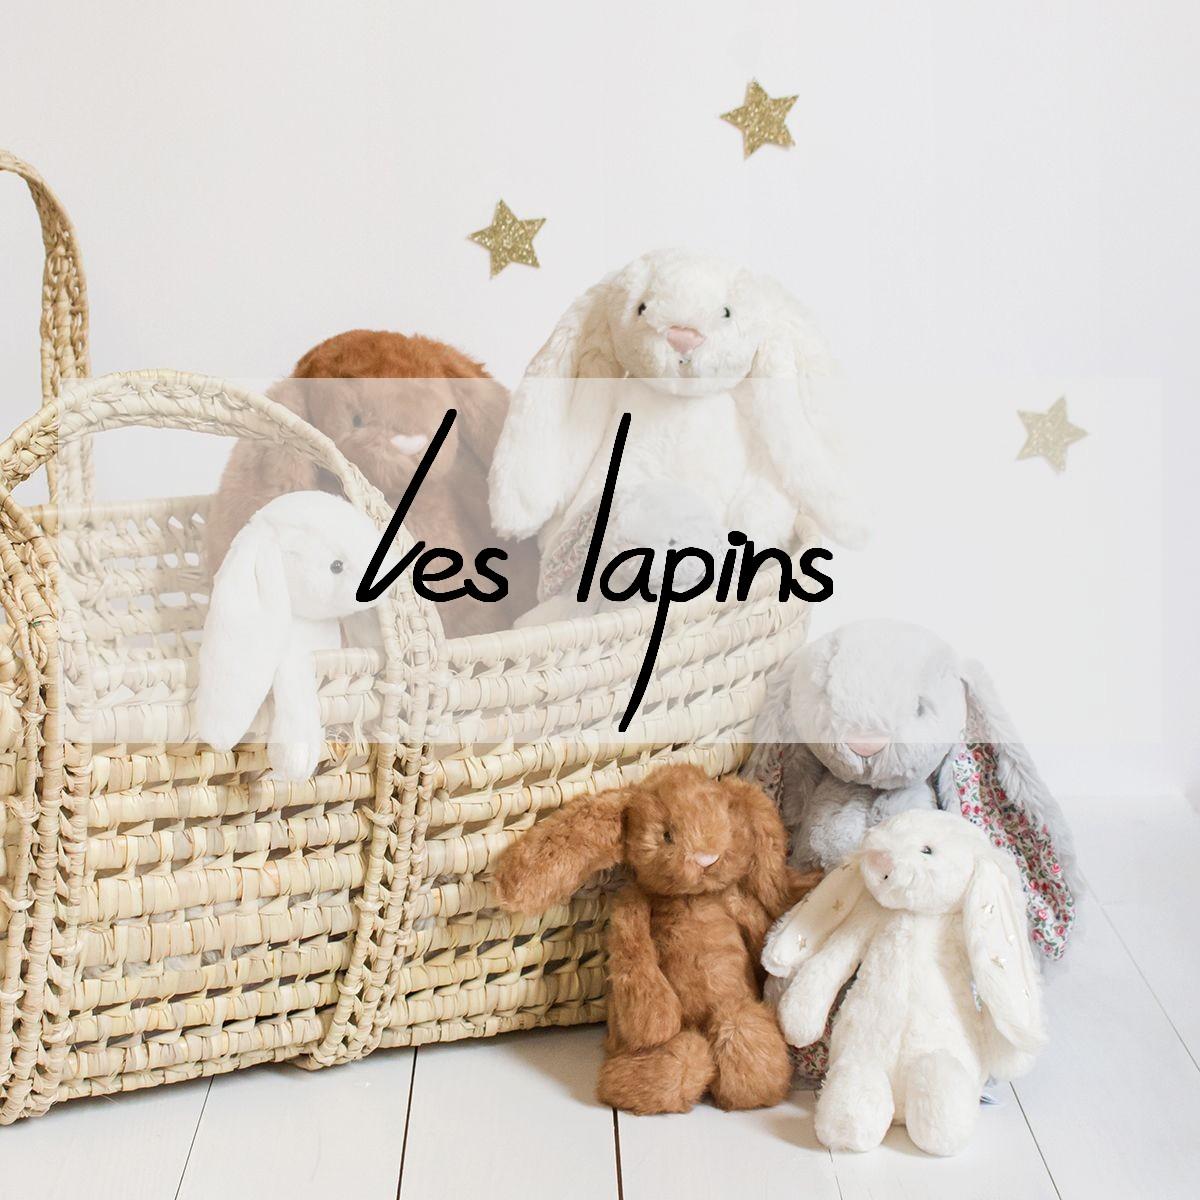 les_lapins_javotine_jellycat.jpg